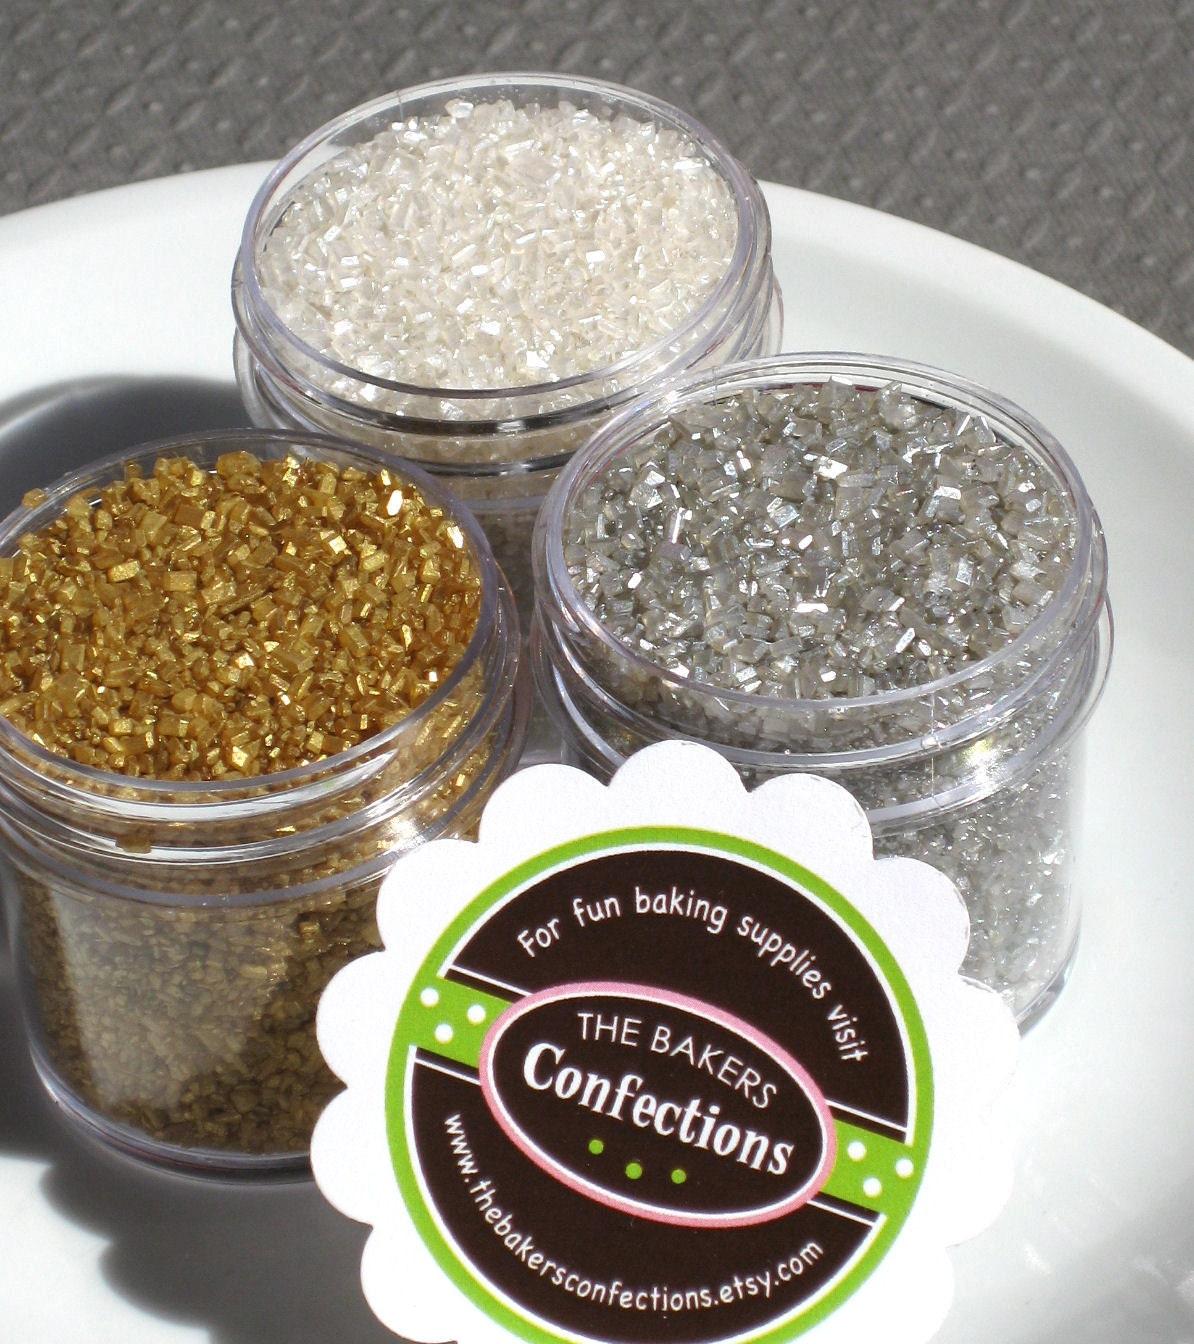 Itty Bitty Silver and Gold Crystal Sugar Kit - 3 mini jar pack (1 oz jars)